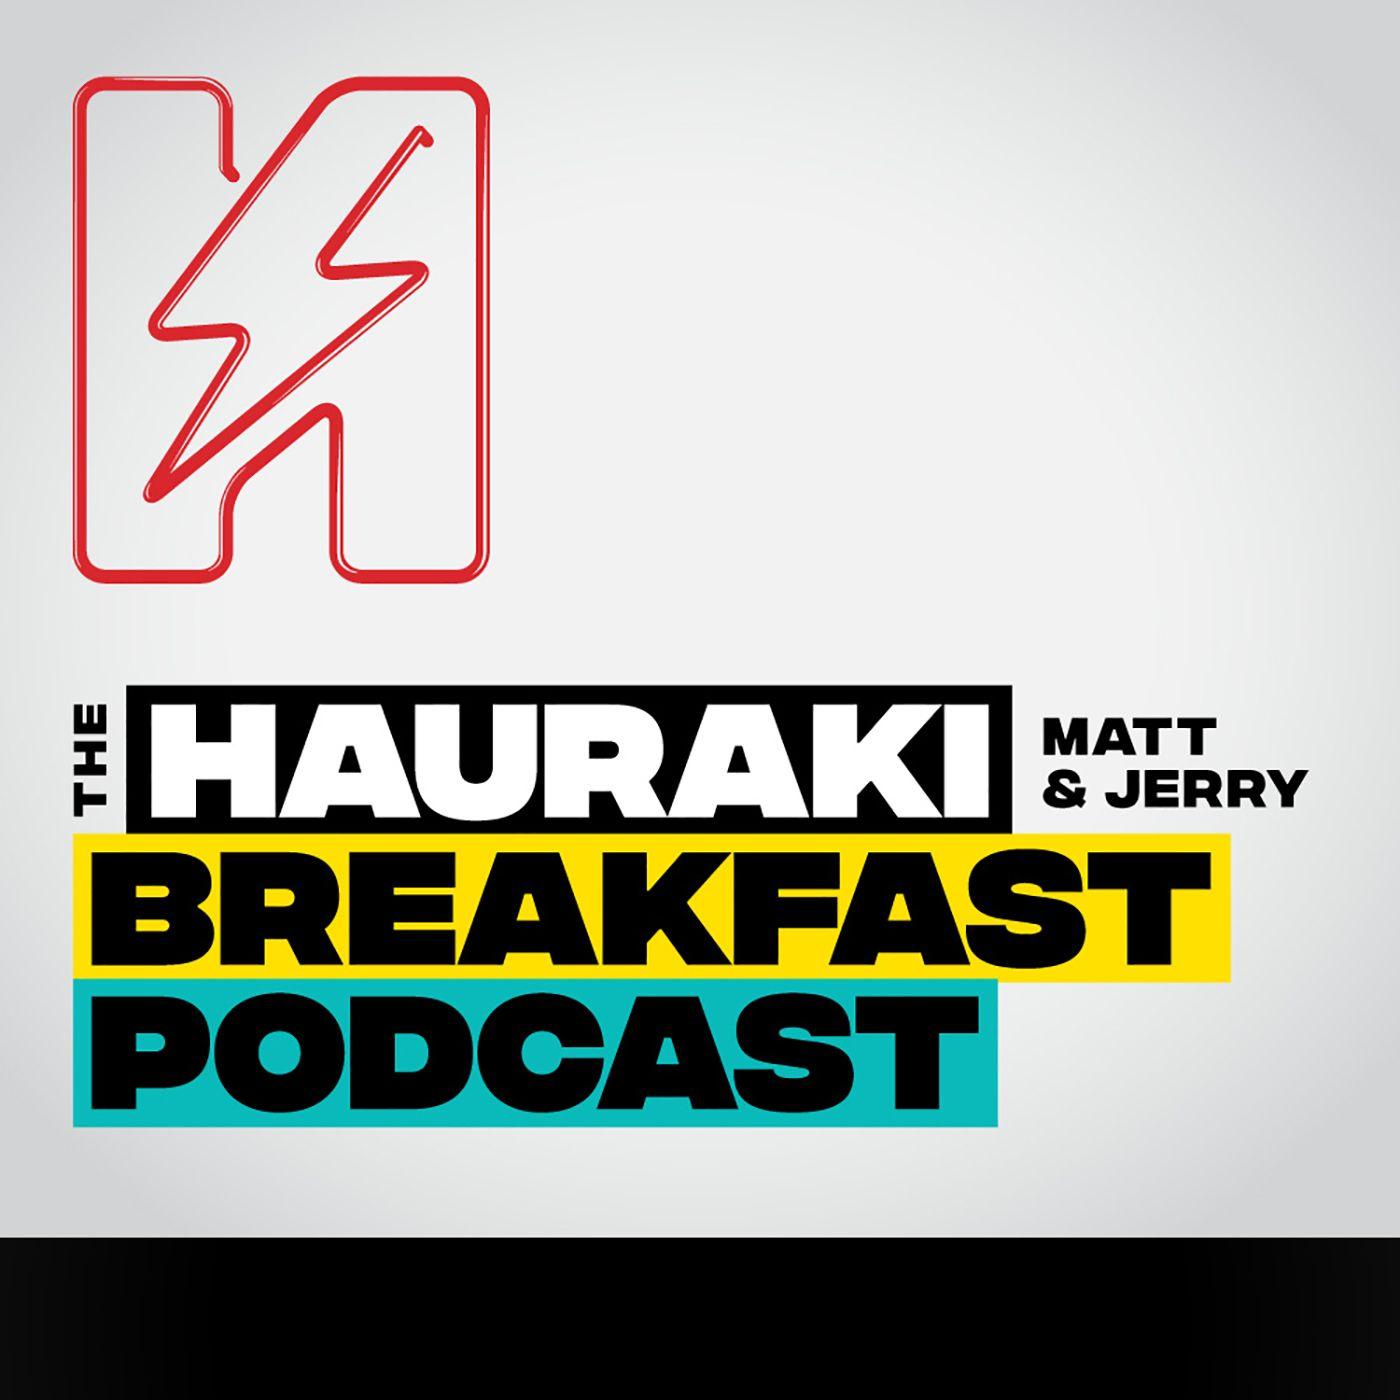 The Hauraki Breakfast